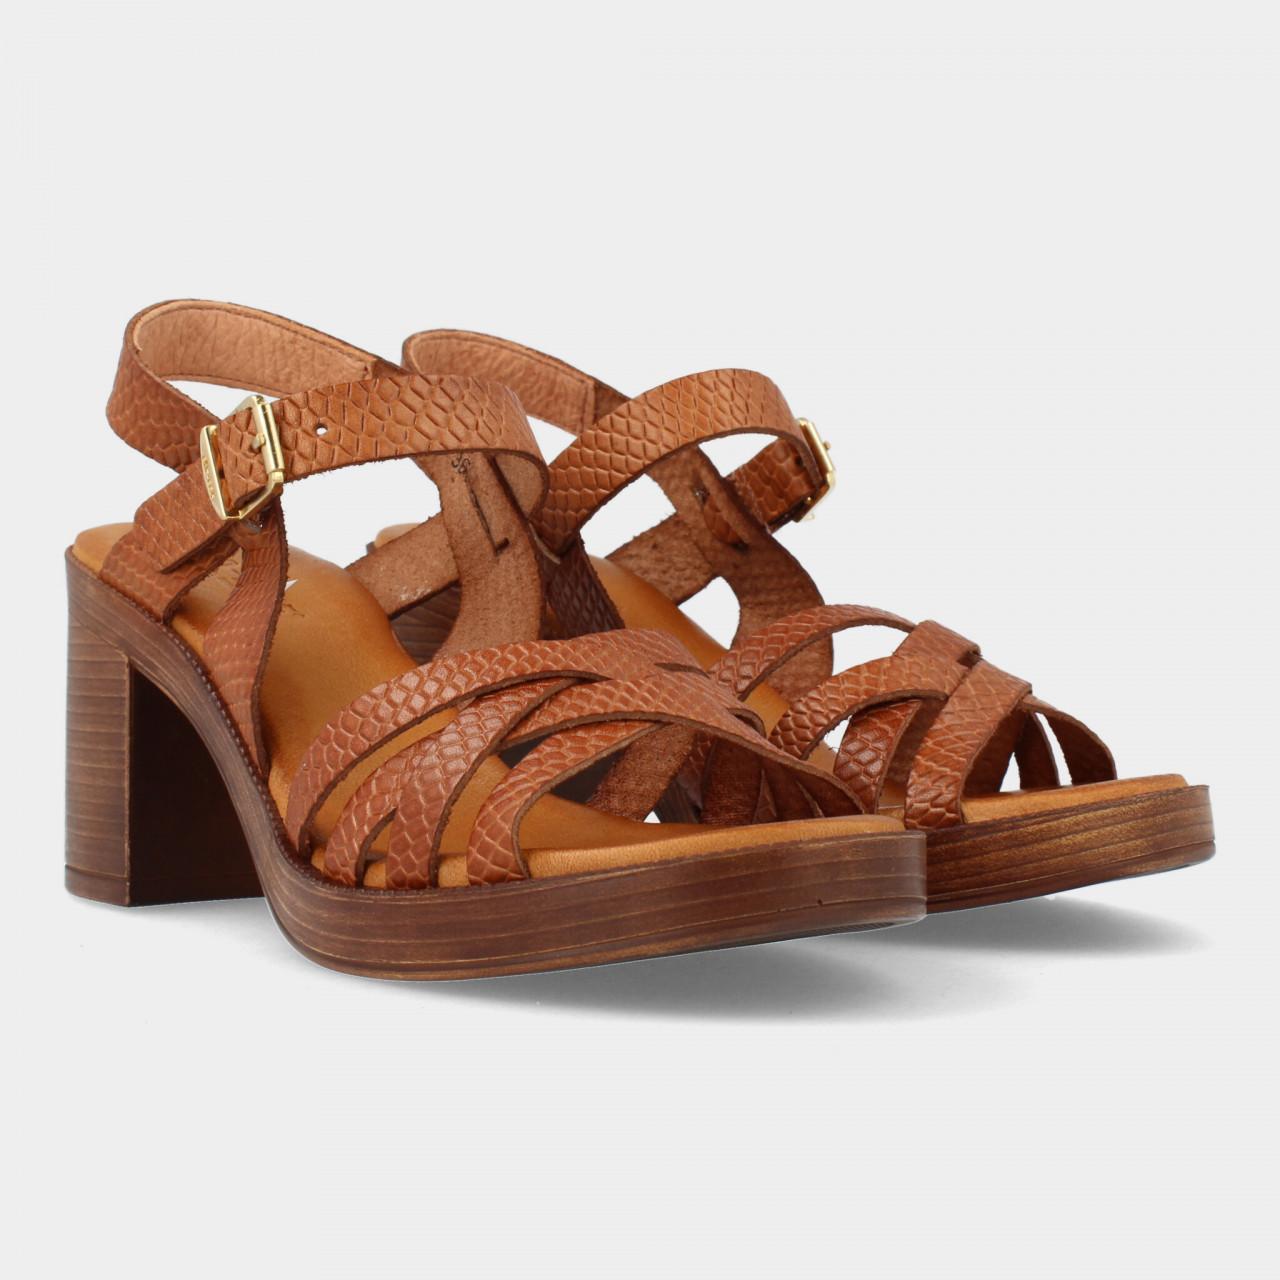 79254 | Women Heel Sandal